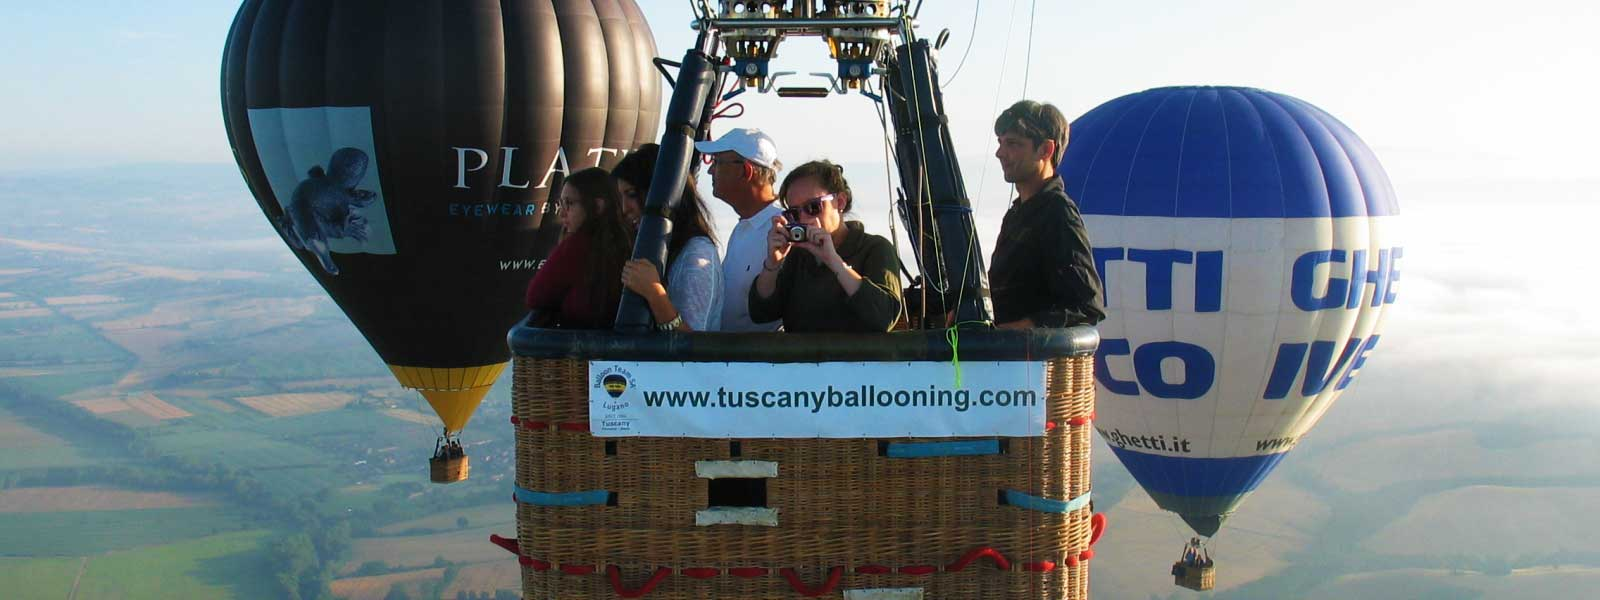 balloons-in-flight-over-buonconvento-siena